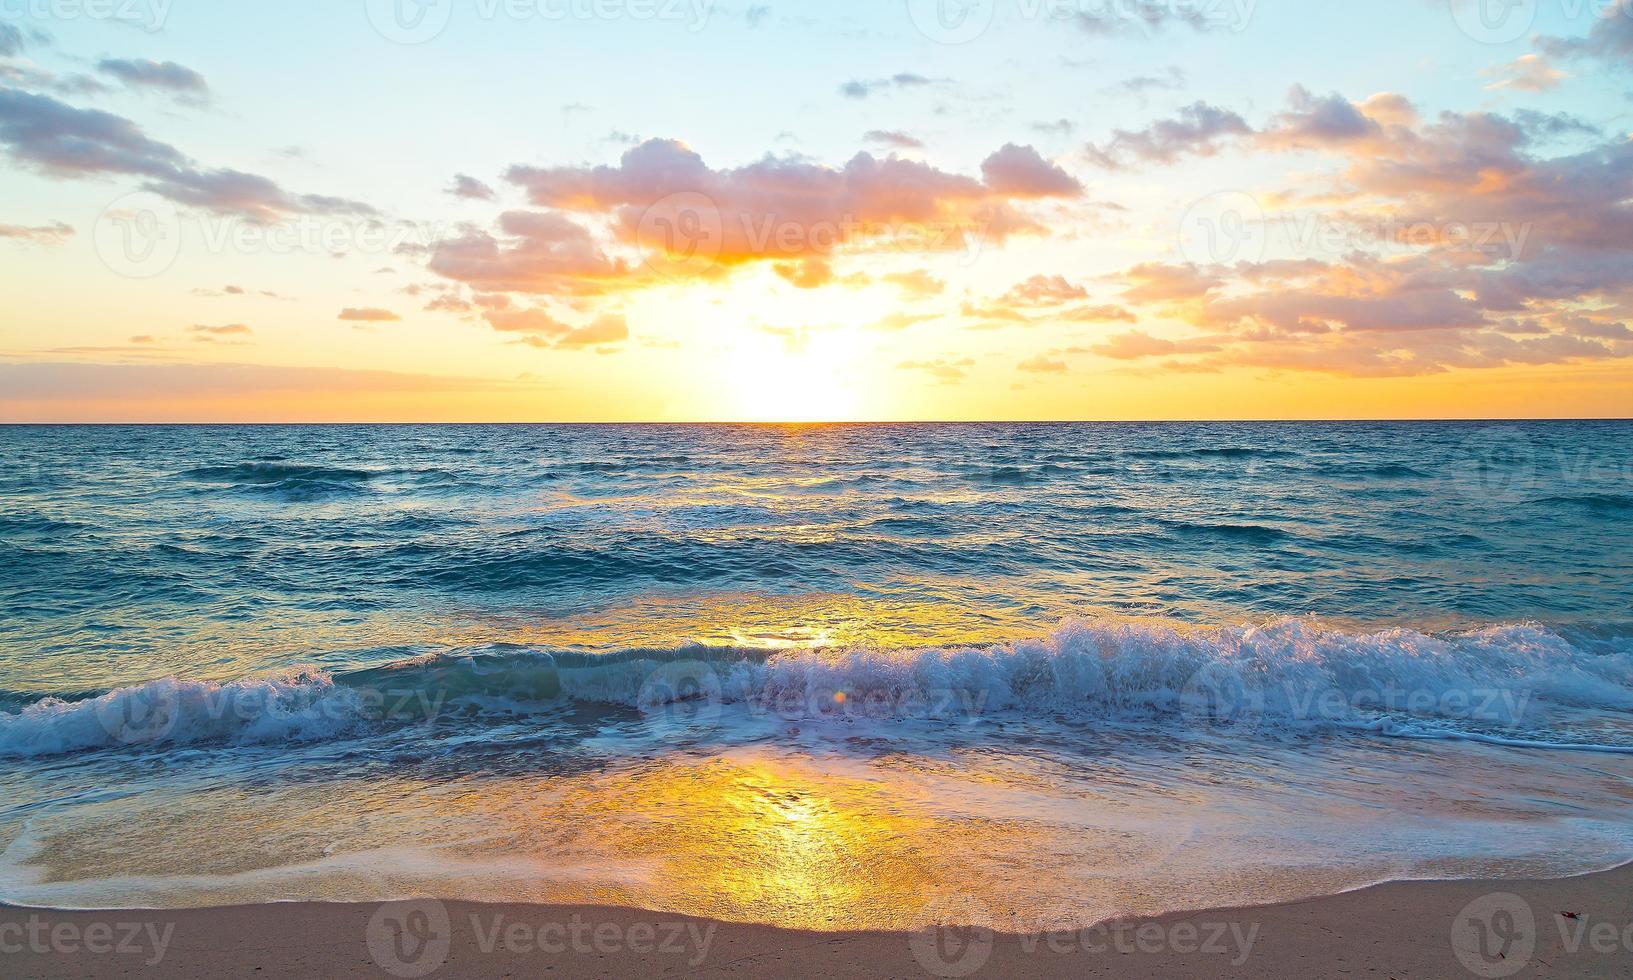 Sonnenaufgang über dem Ozean in Miami Beach, Florida. foto